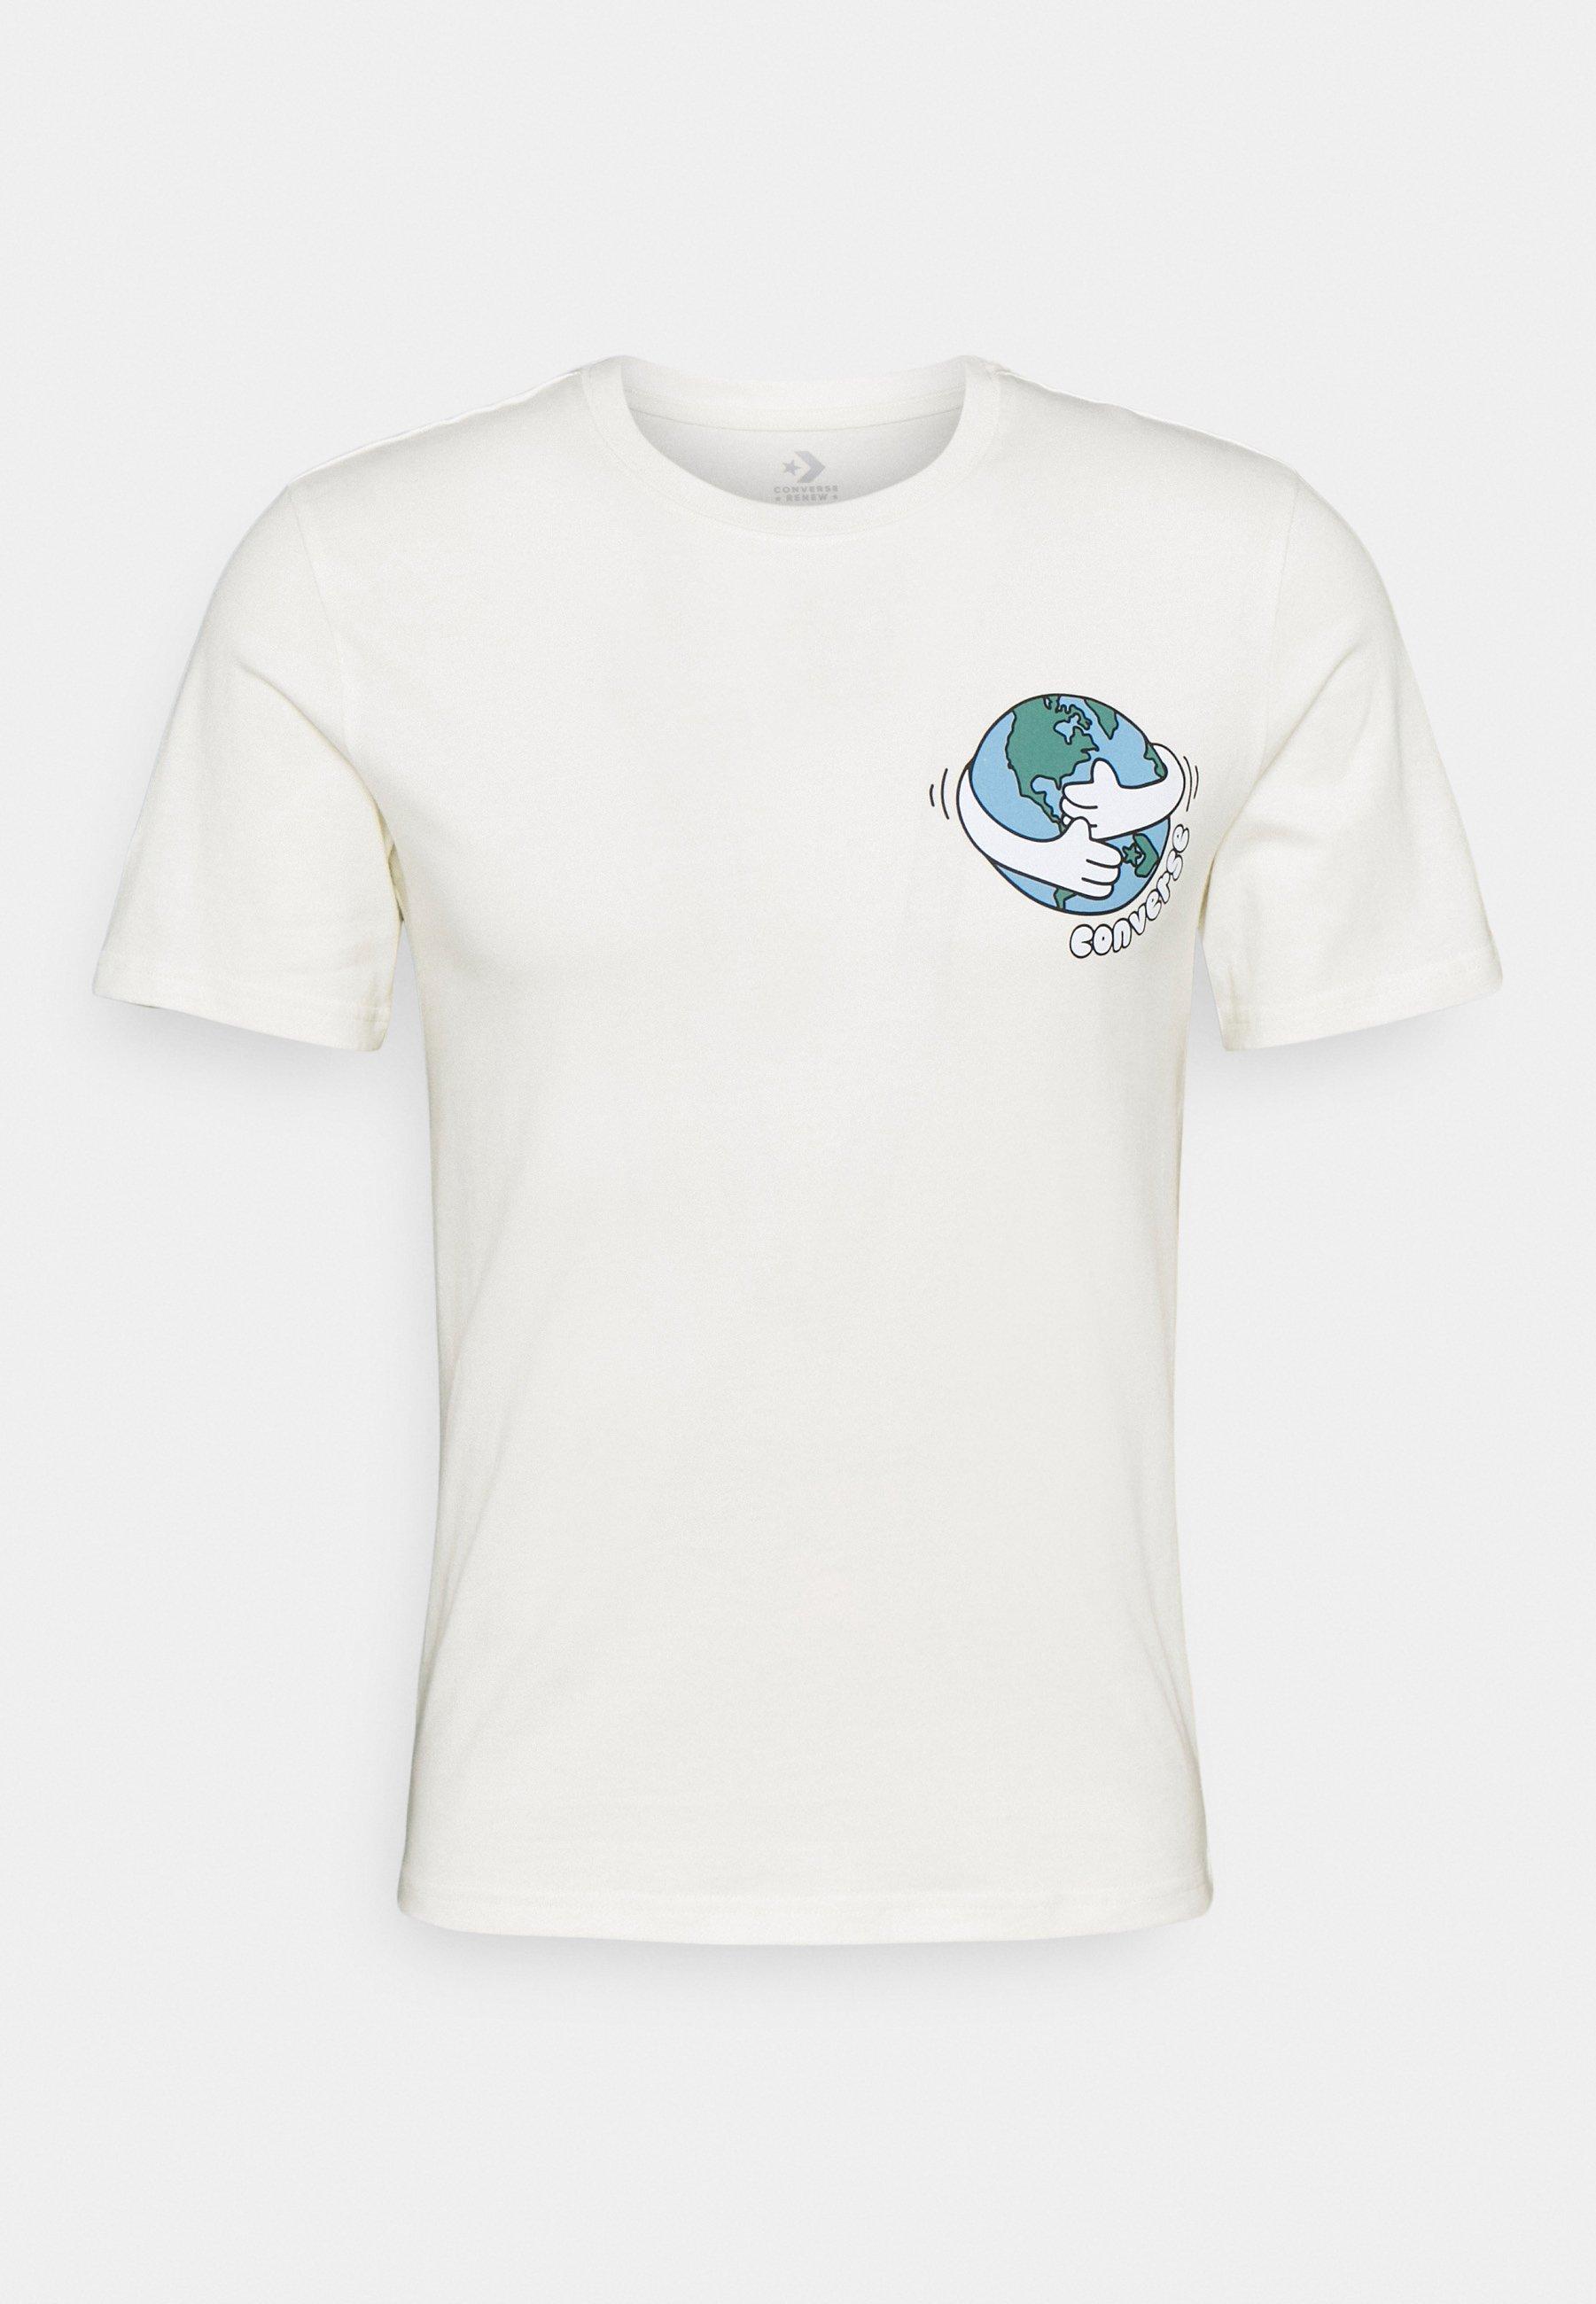 Men RENEW LOVE YOUR MOTHER GRAPHIC TEE UNISEX - Print T-shirt